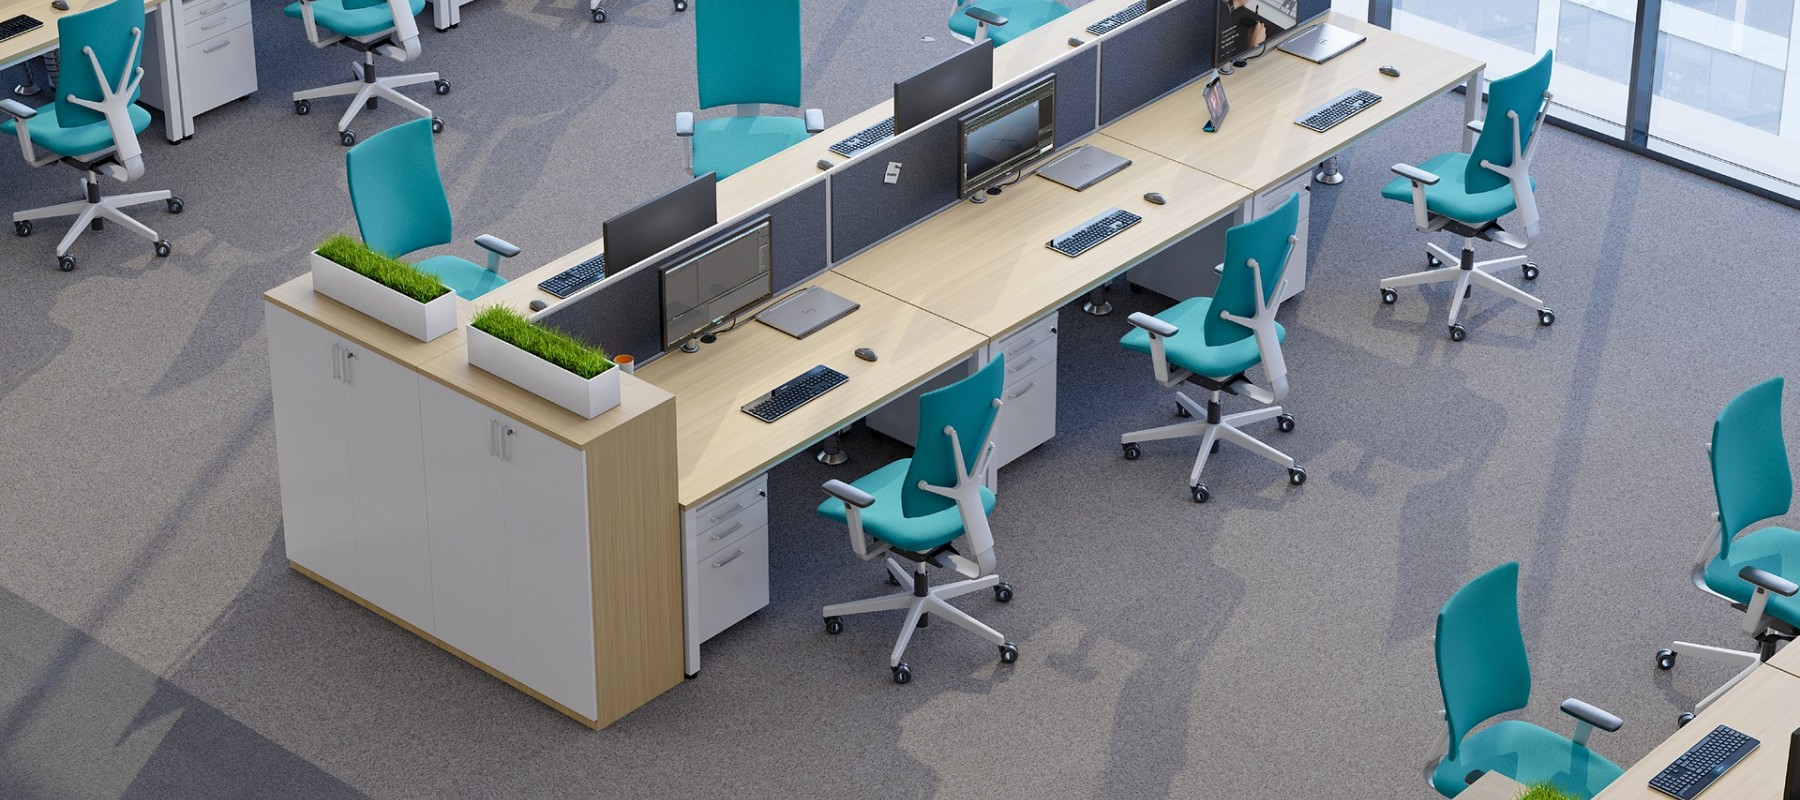 fotele-krzesla-siedziska-4me-2me-aranzacje06